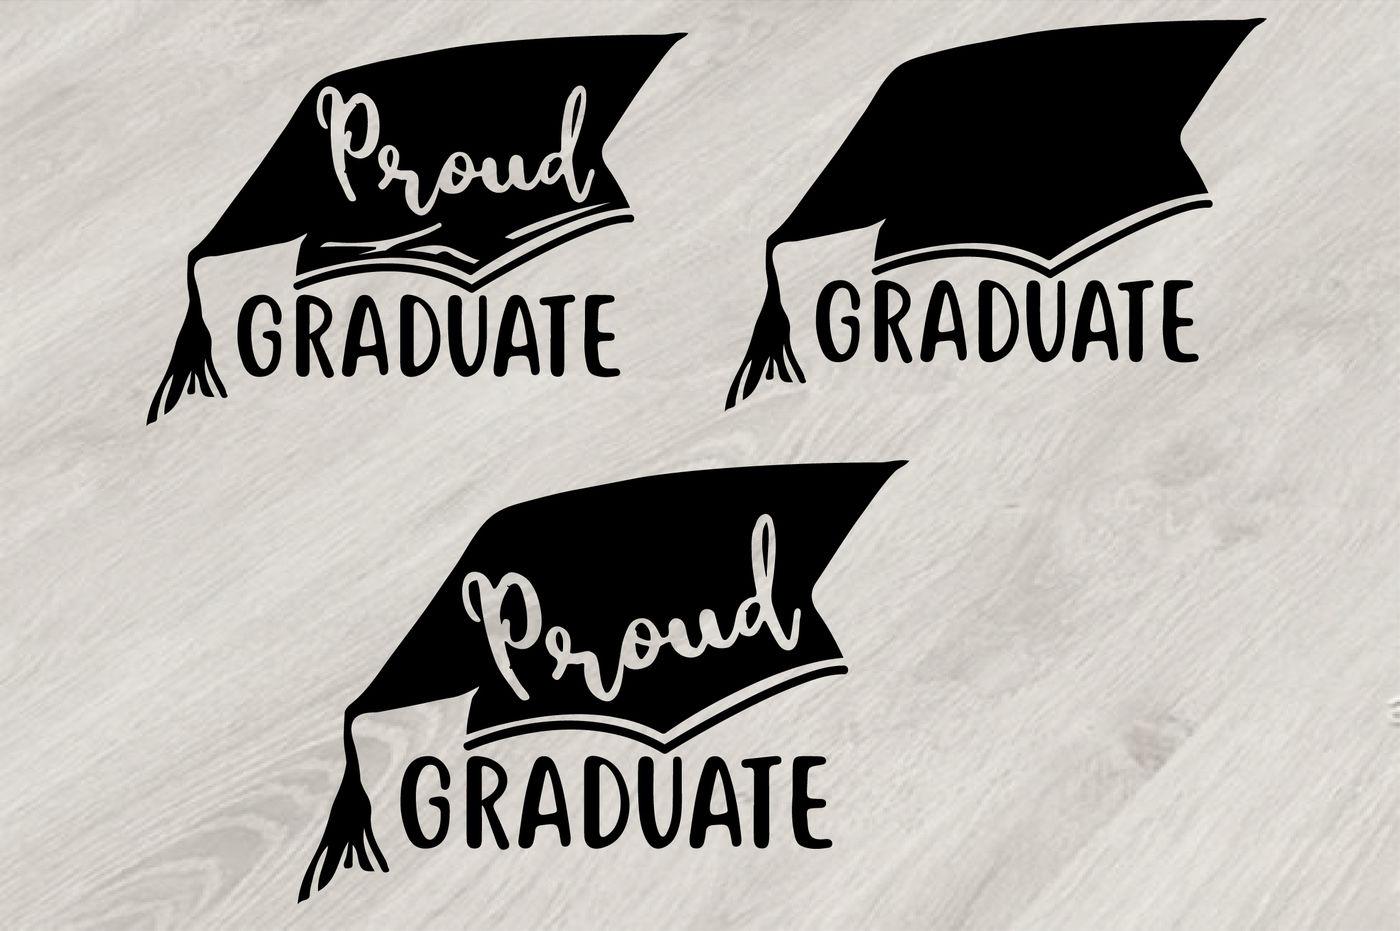 Proud Graduate Silhouette Svg Grad Cap Kindergarten High School